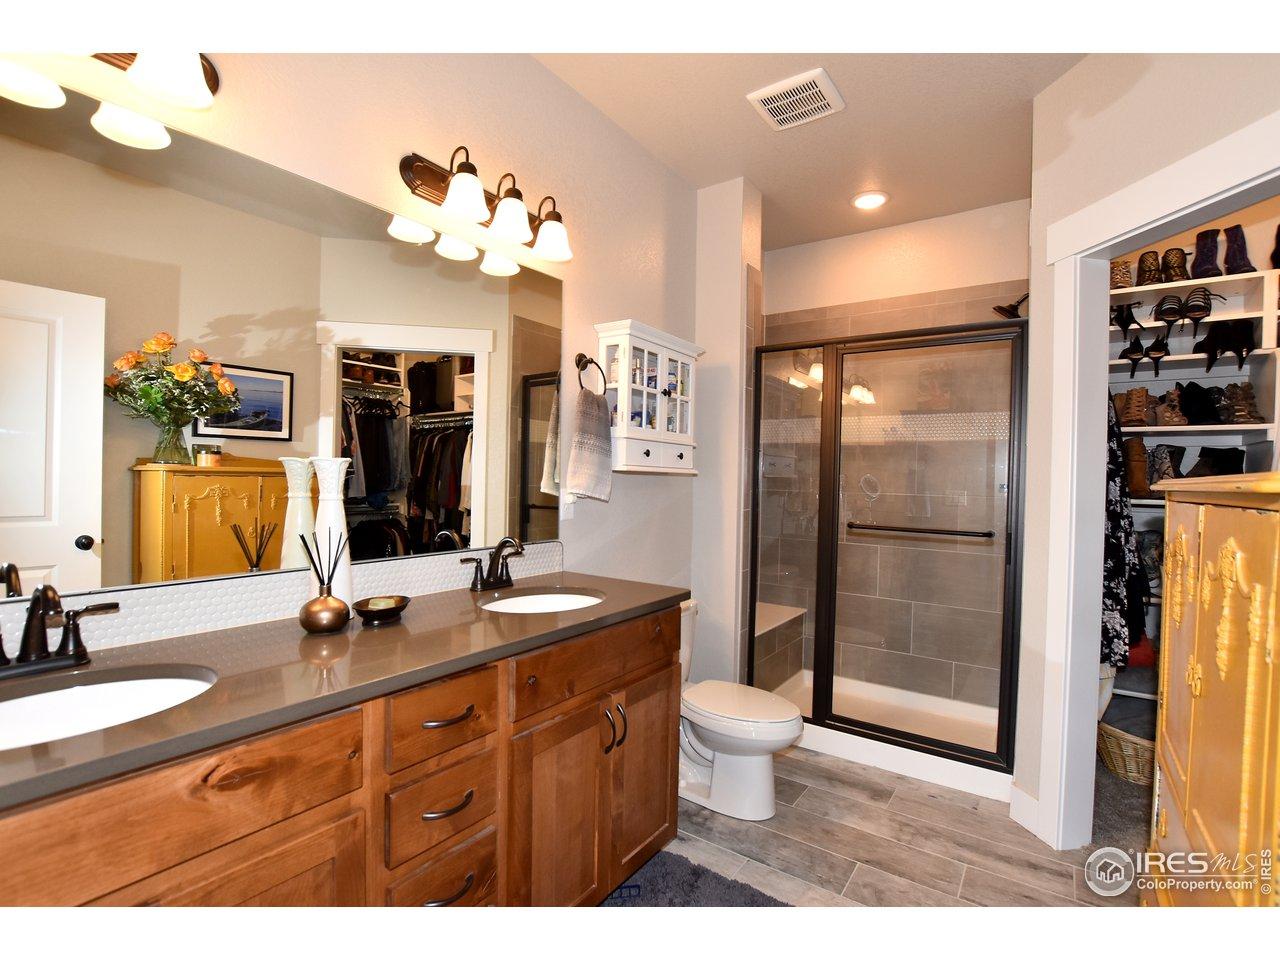 Spacious Master en-suite bathroom w/ oversized shower, walk in closet and double vanities w/ upgraded quartz counters!